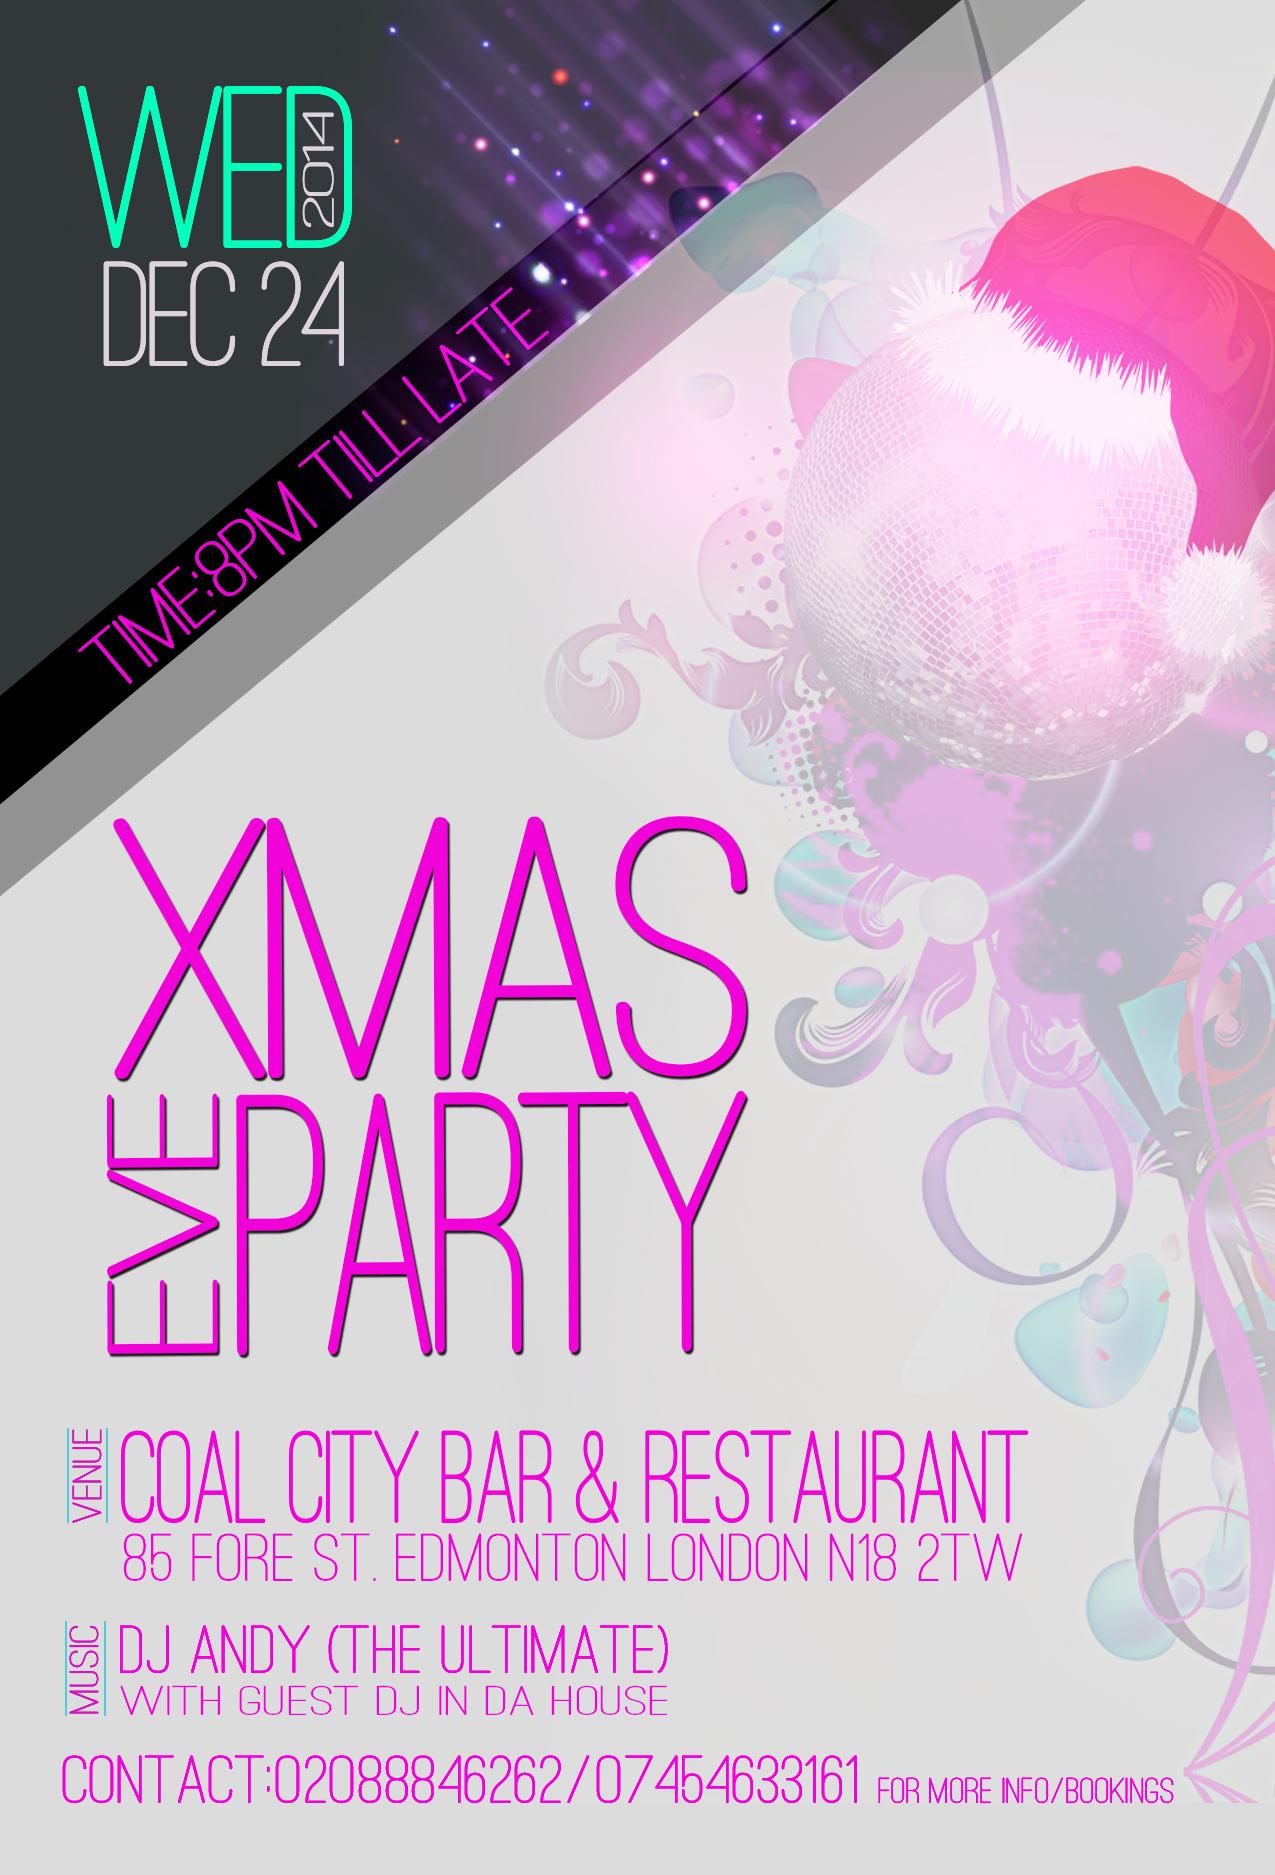 Xmas Eve Party Flyer